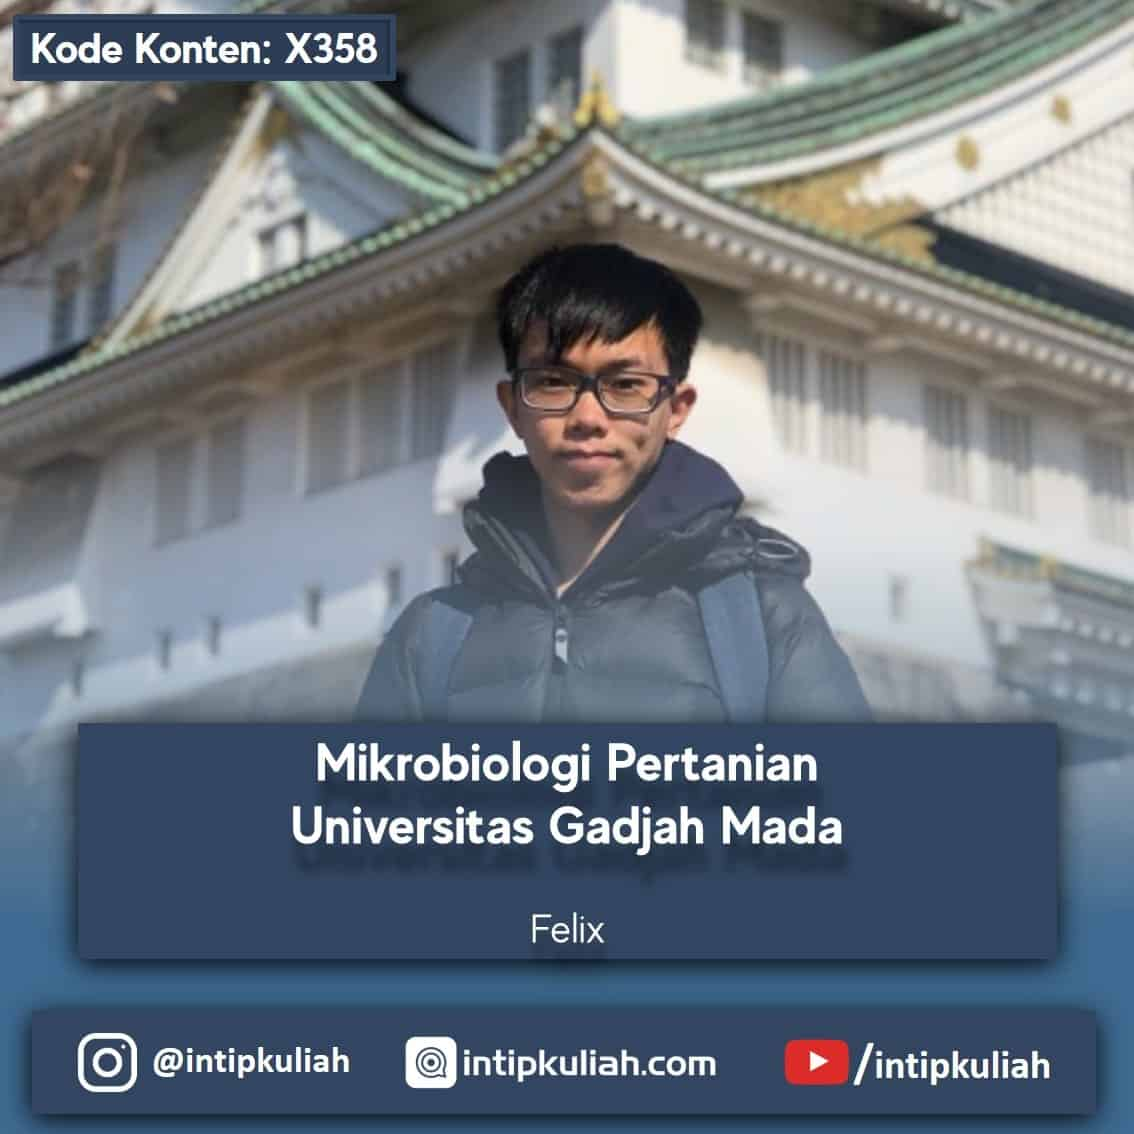 Mikrobiologi Pertanian Universitas Gadjah Mada (Felix)